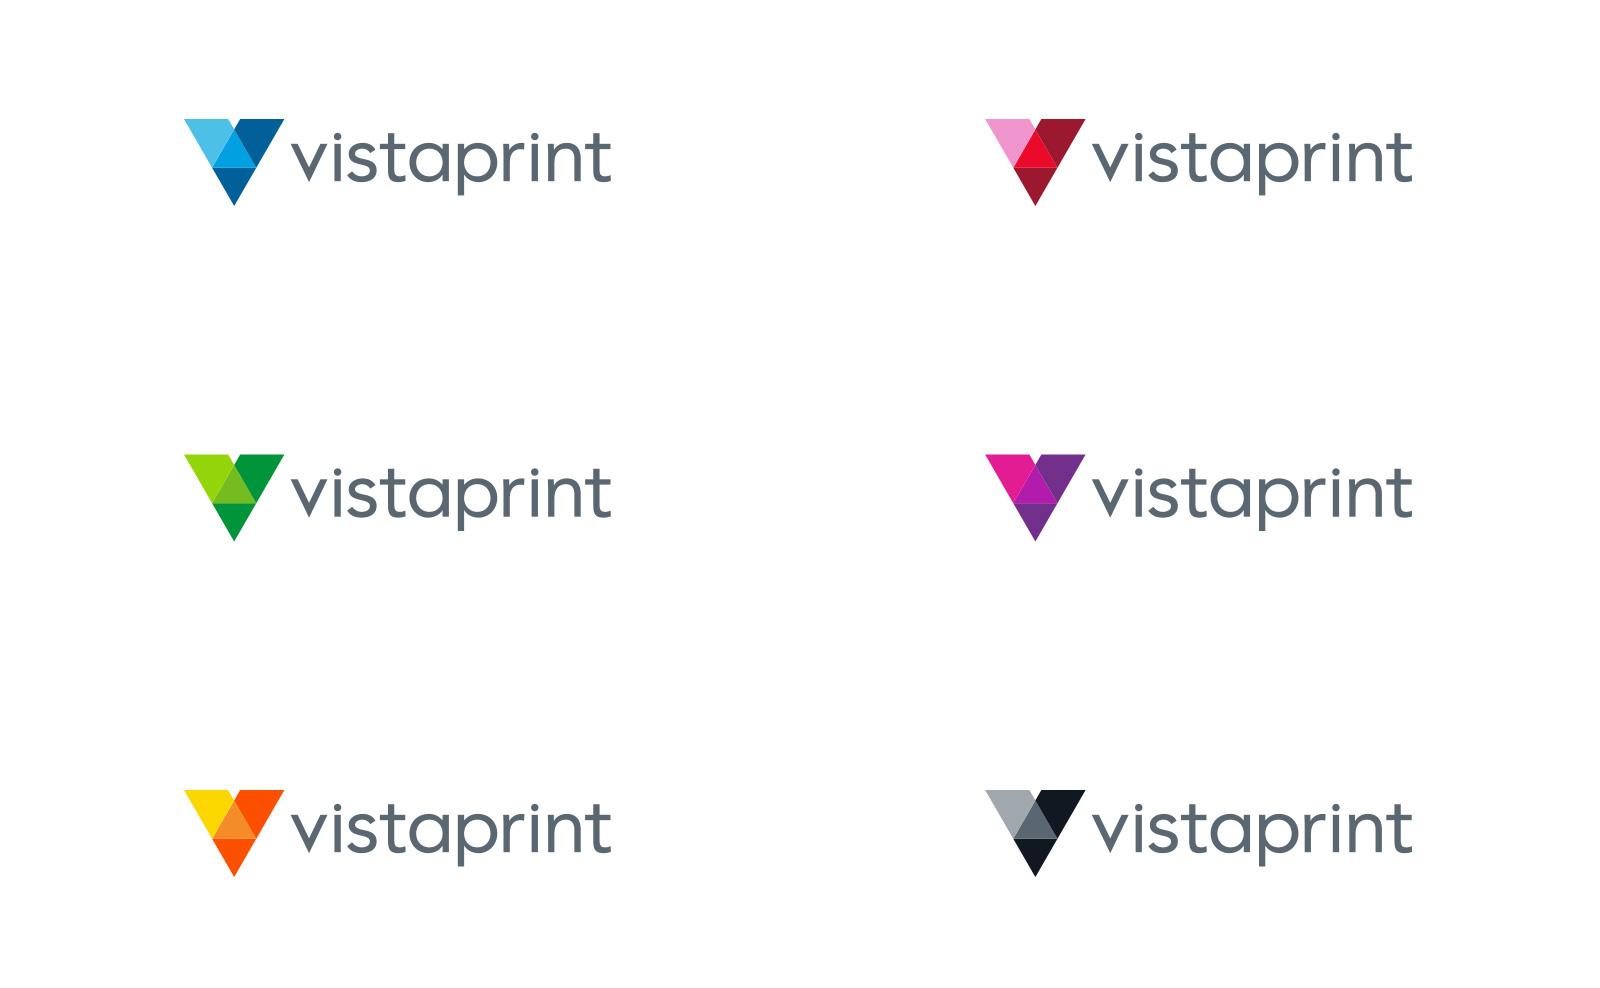 vistaprint-7